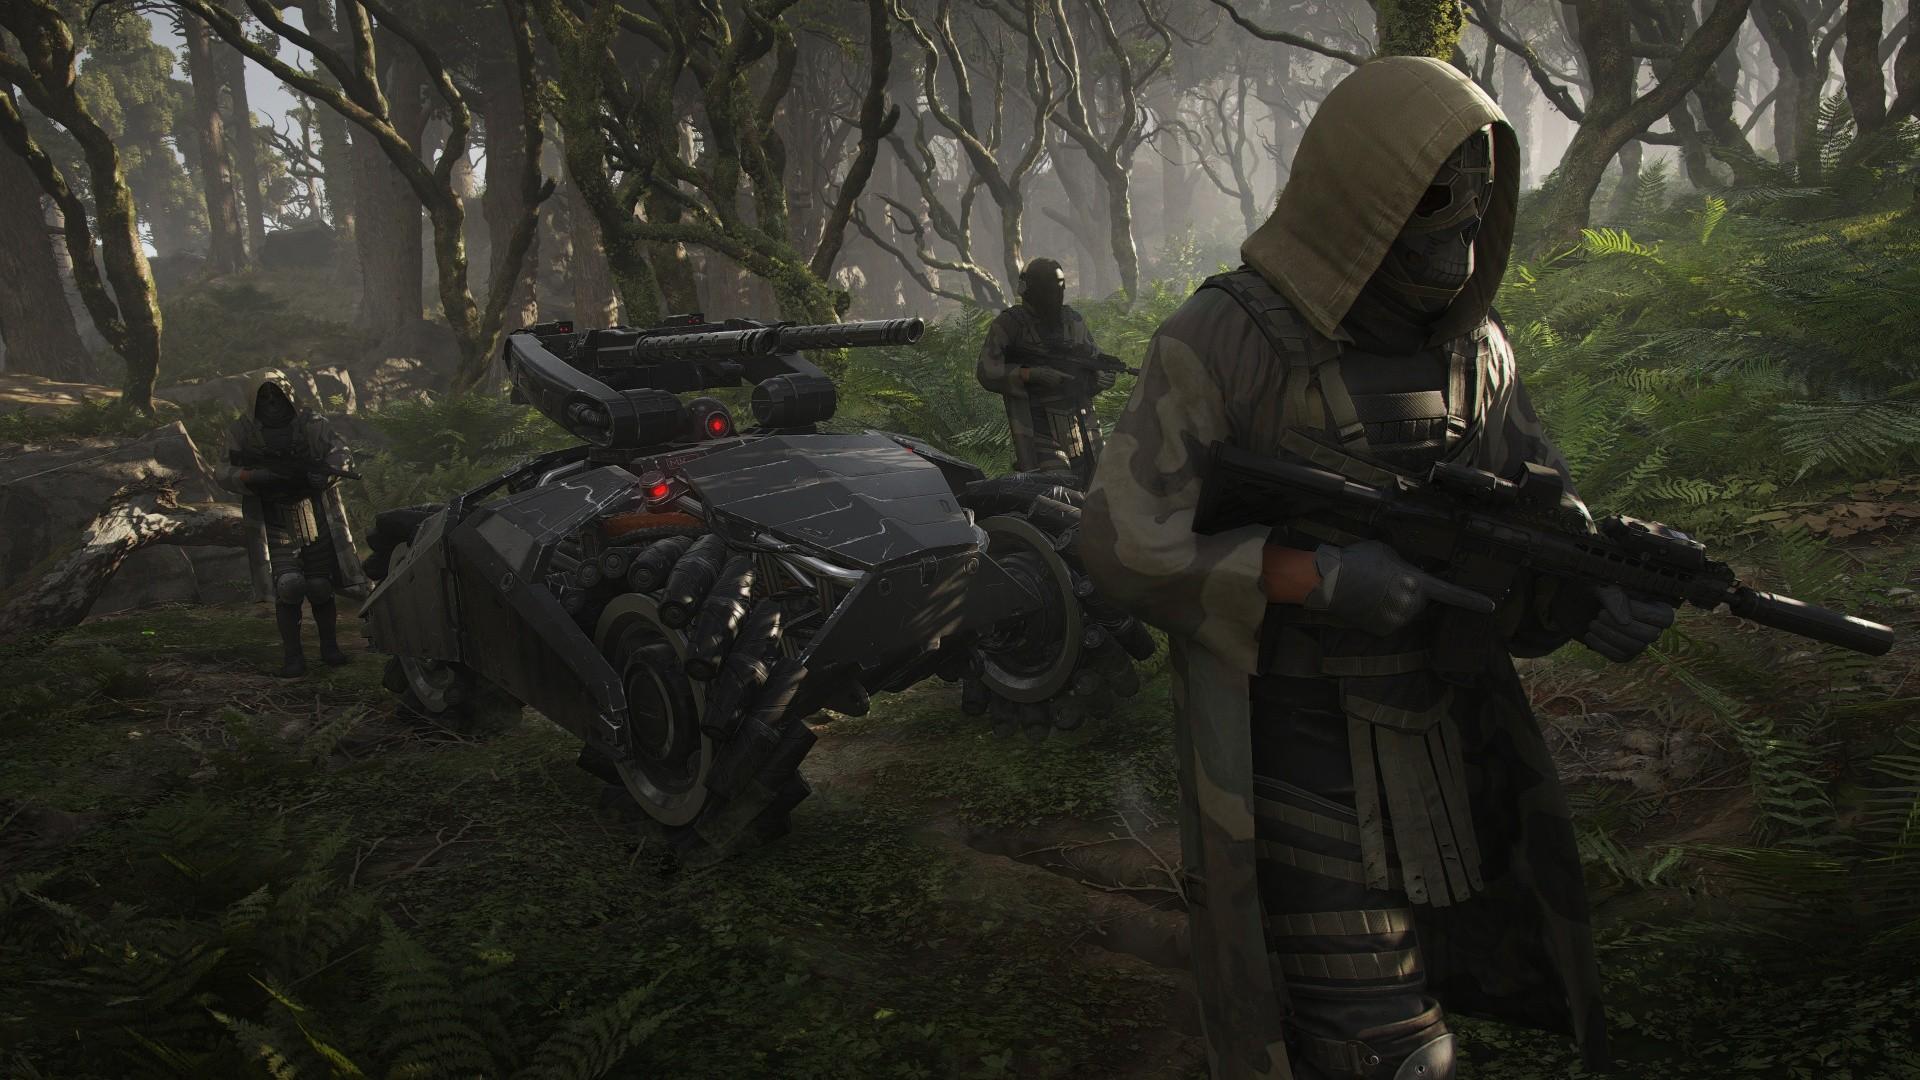 Tom Clancy's Ghost Recon Breakpoint Screenshot 2